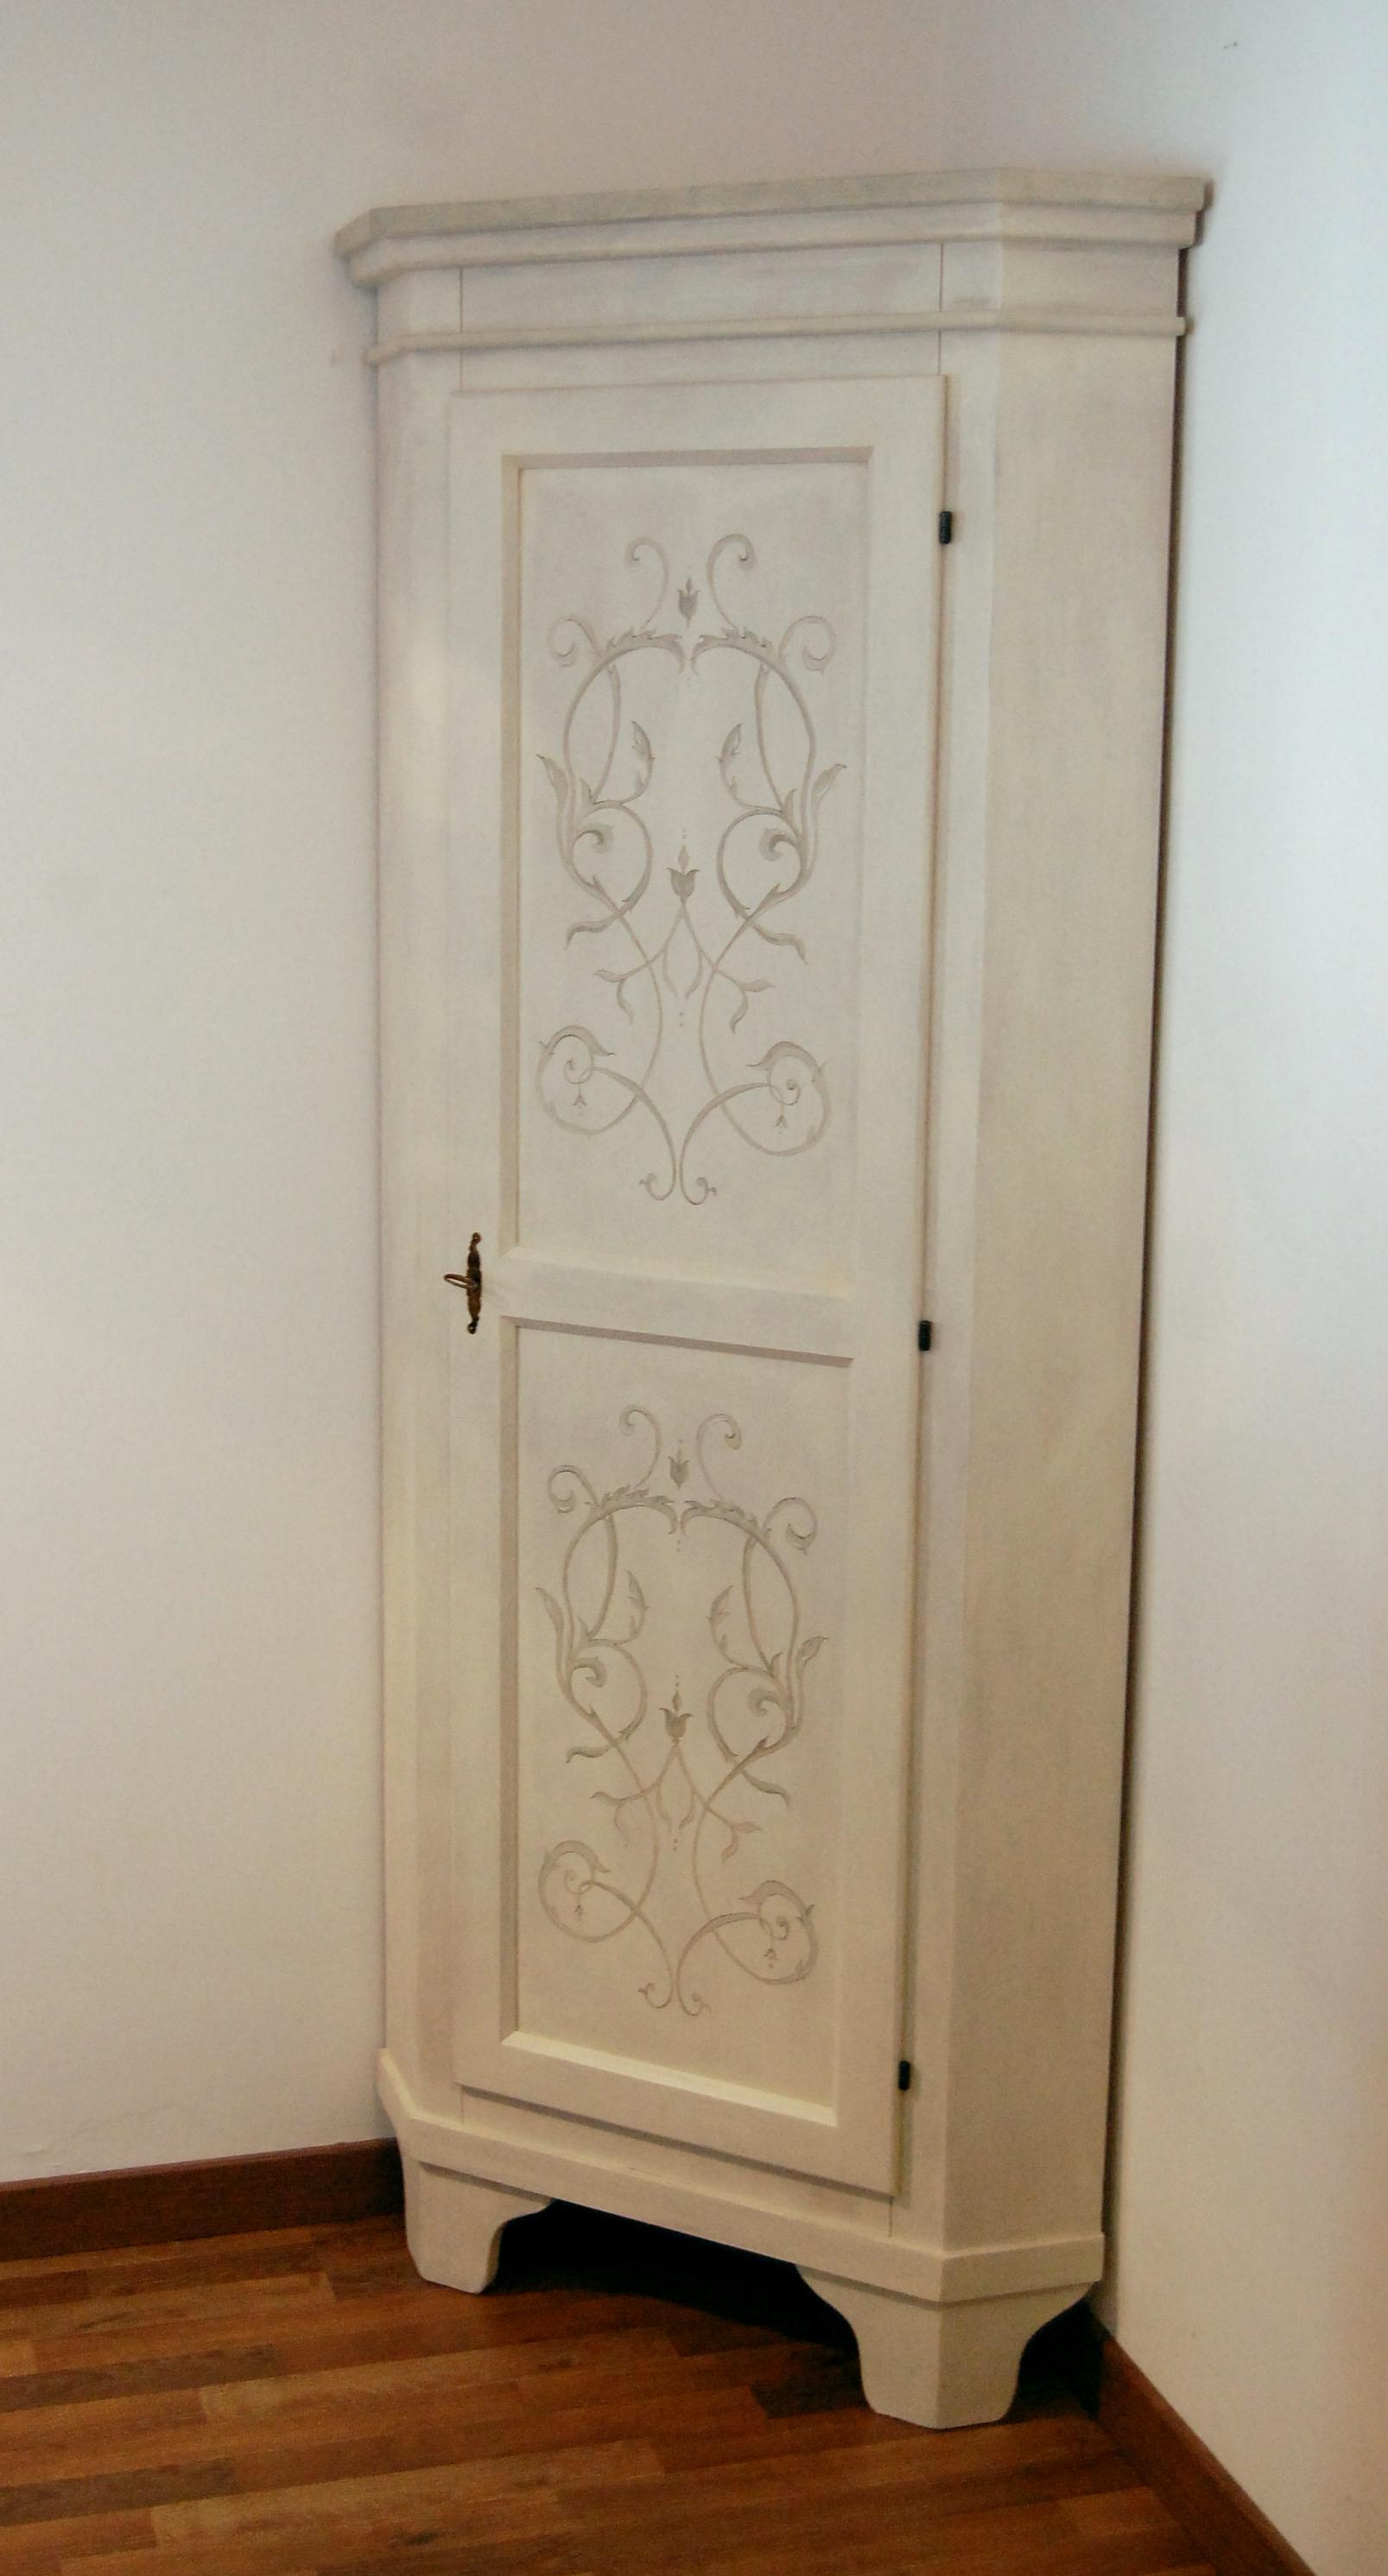 Top mobili decorati a mano a Trieste - studio d'interni g.t.f.  VG52